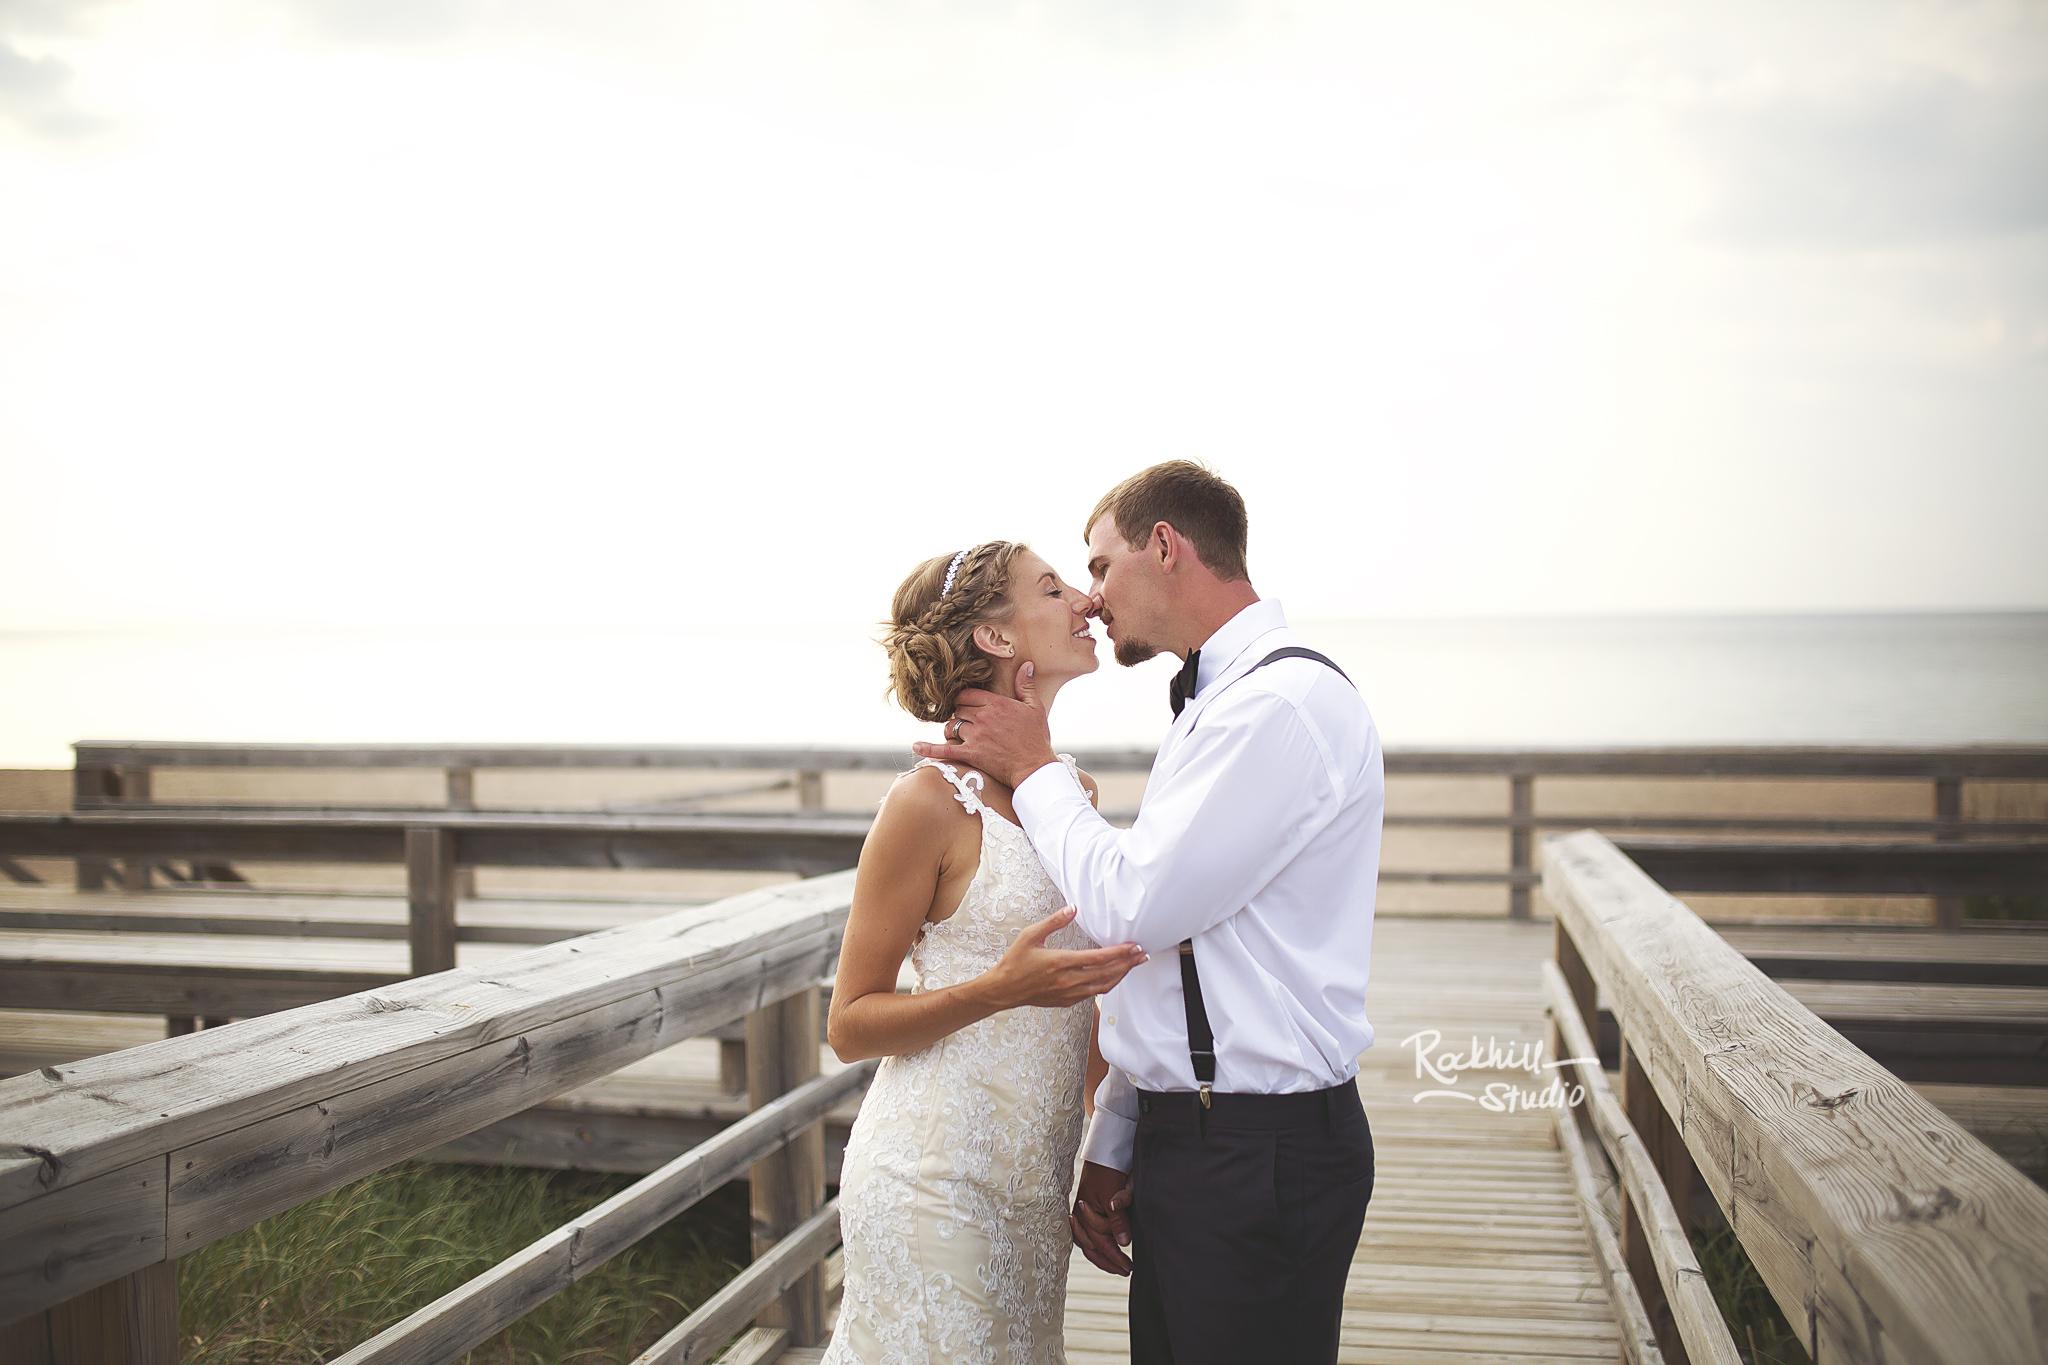 grand-marais-wedding-photographer-lake-superior-michigan-rockhill-2.jpg